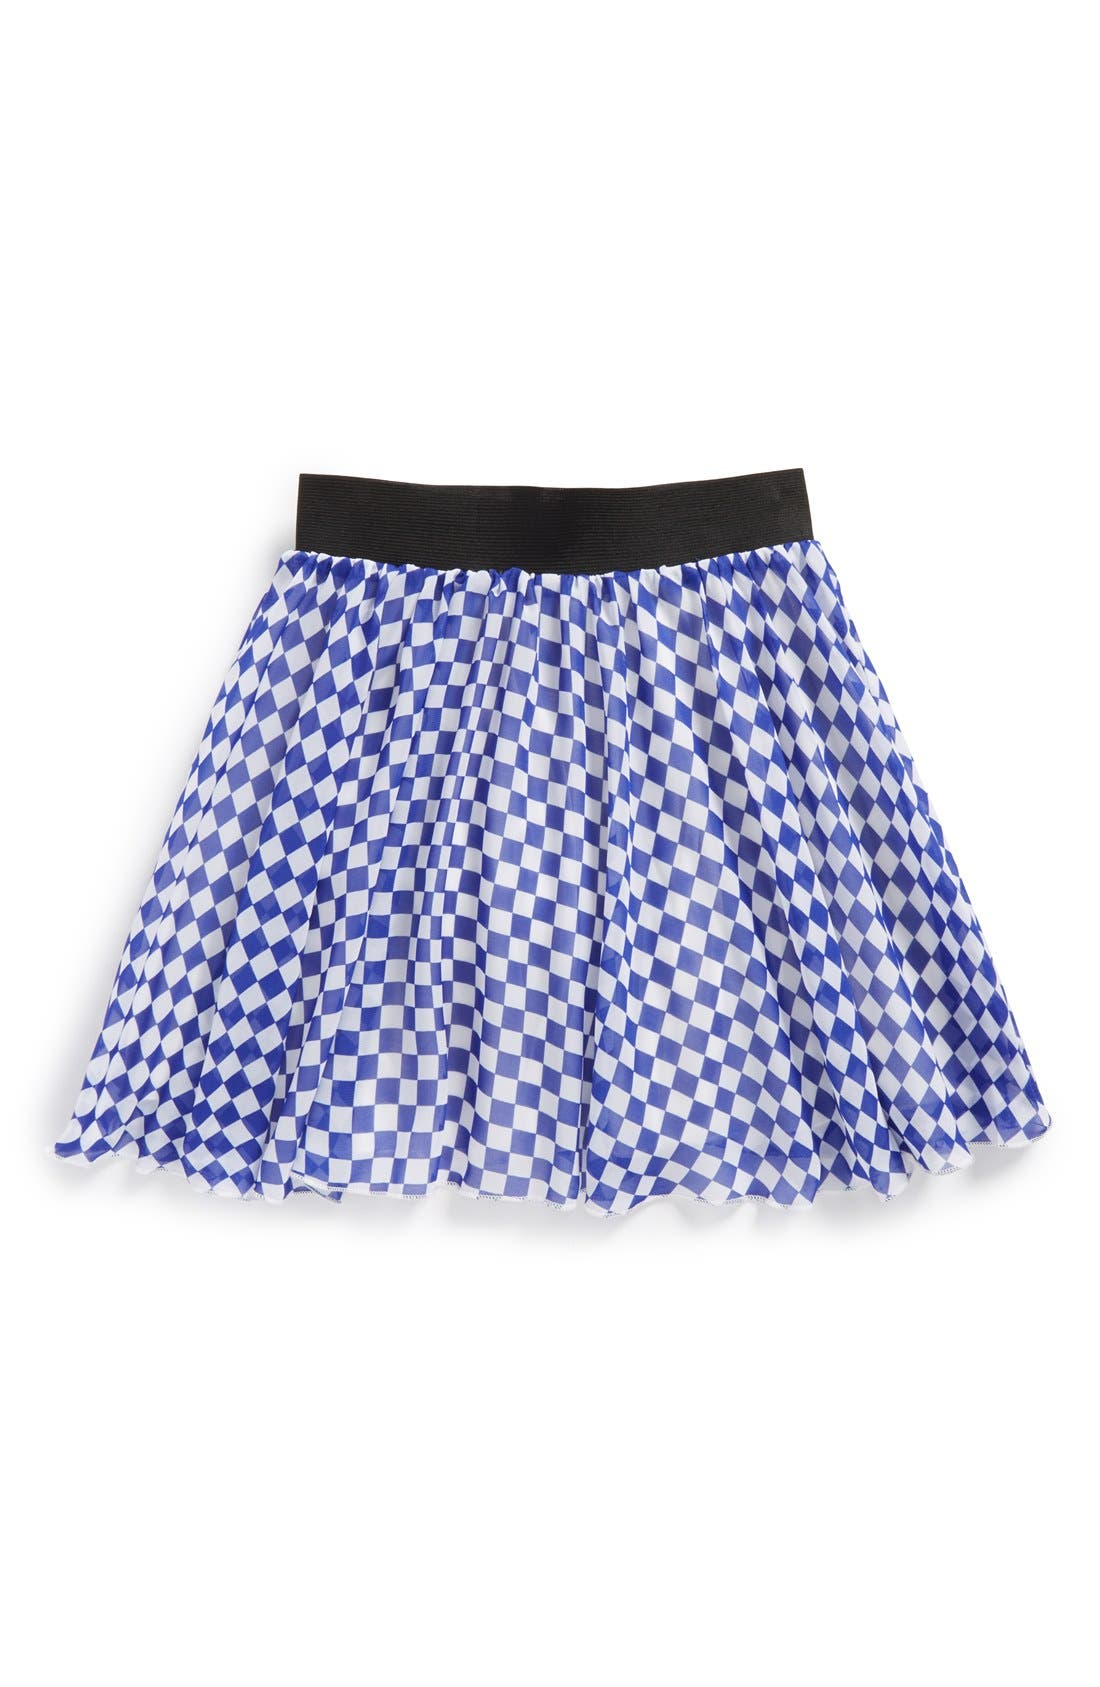 Alternate Image 1 Selected - Un Deux Trois Chiffon Skater Skirt (Big Girls)(Online Only)